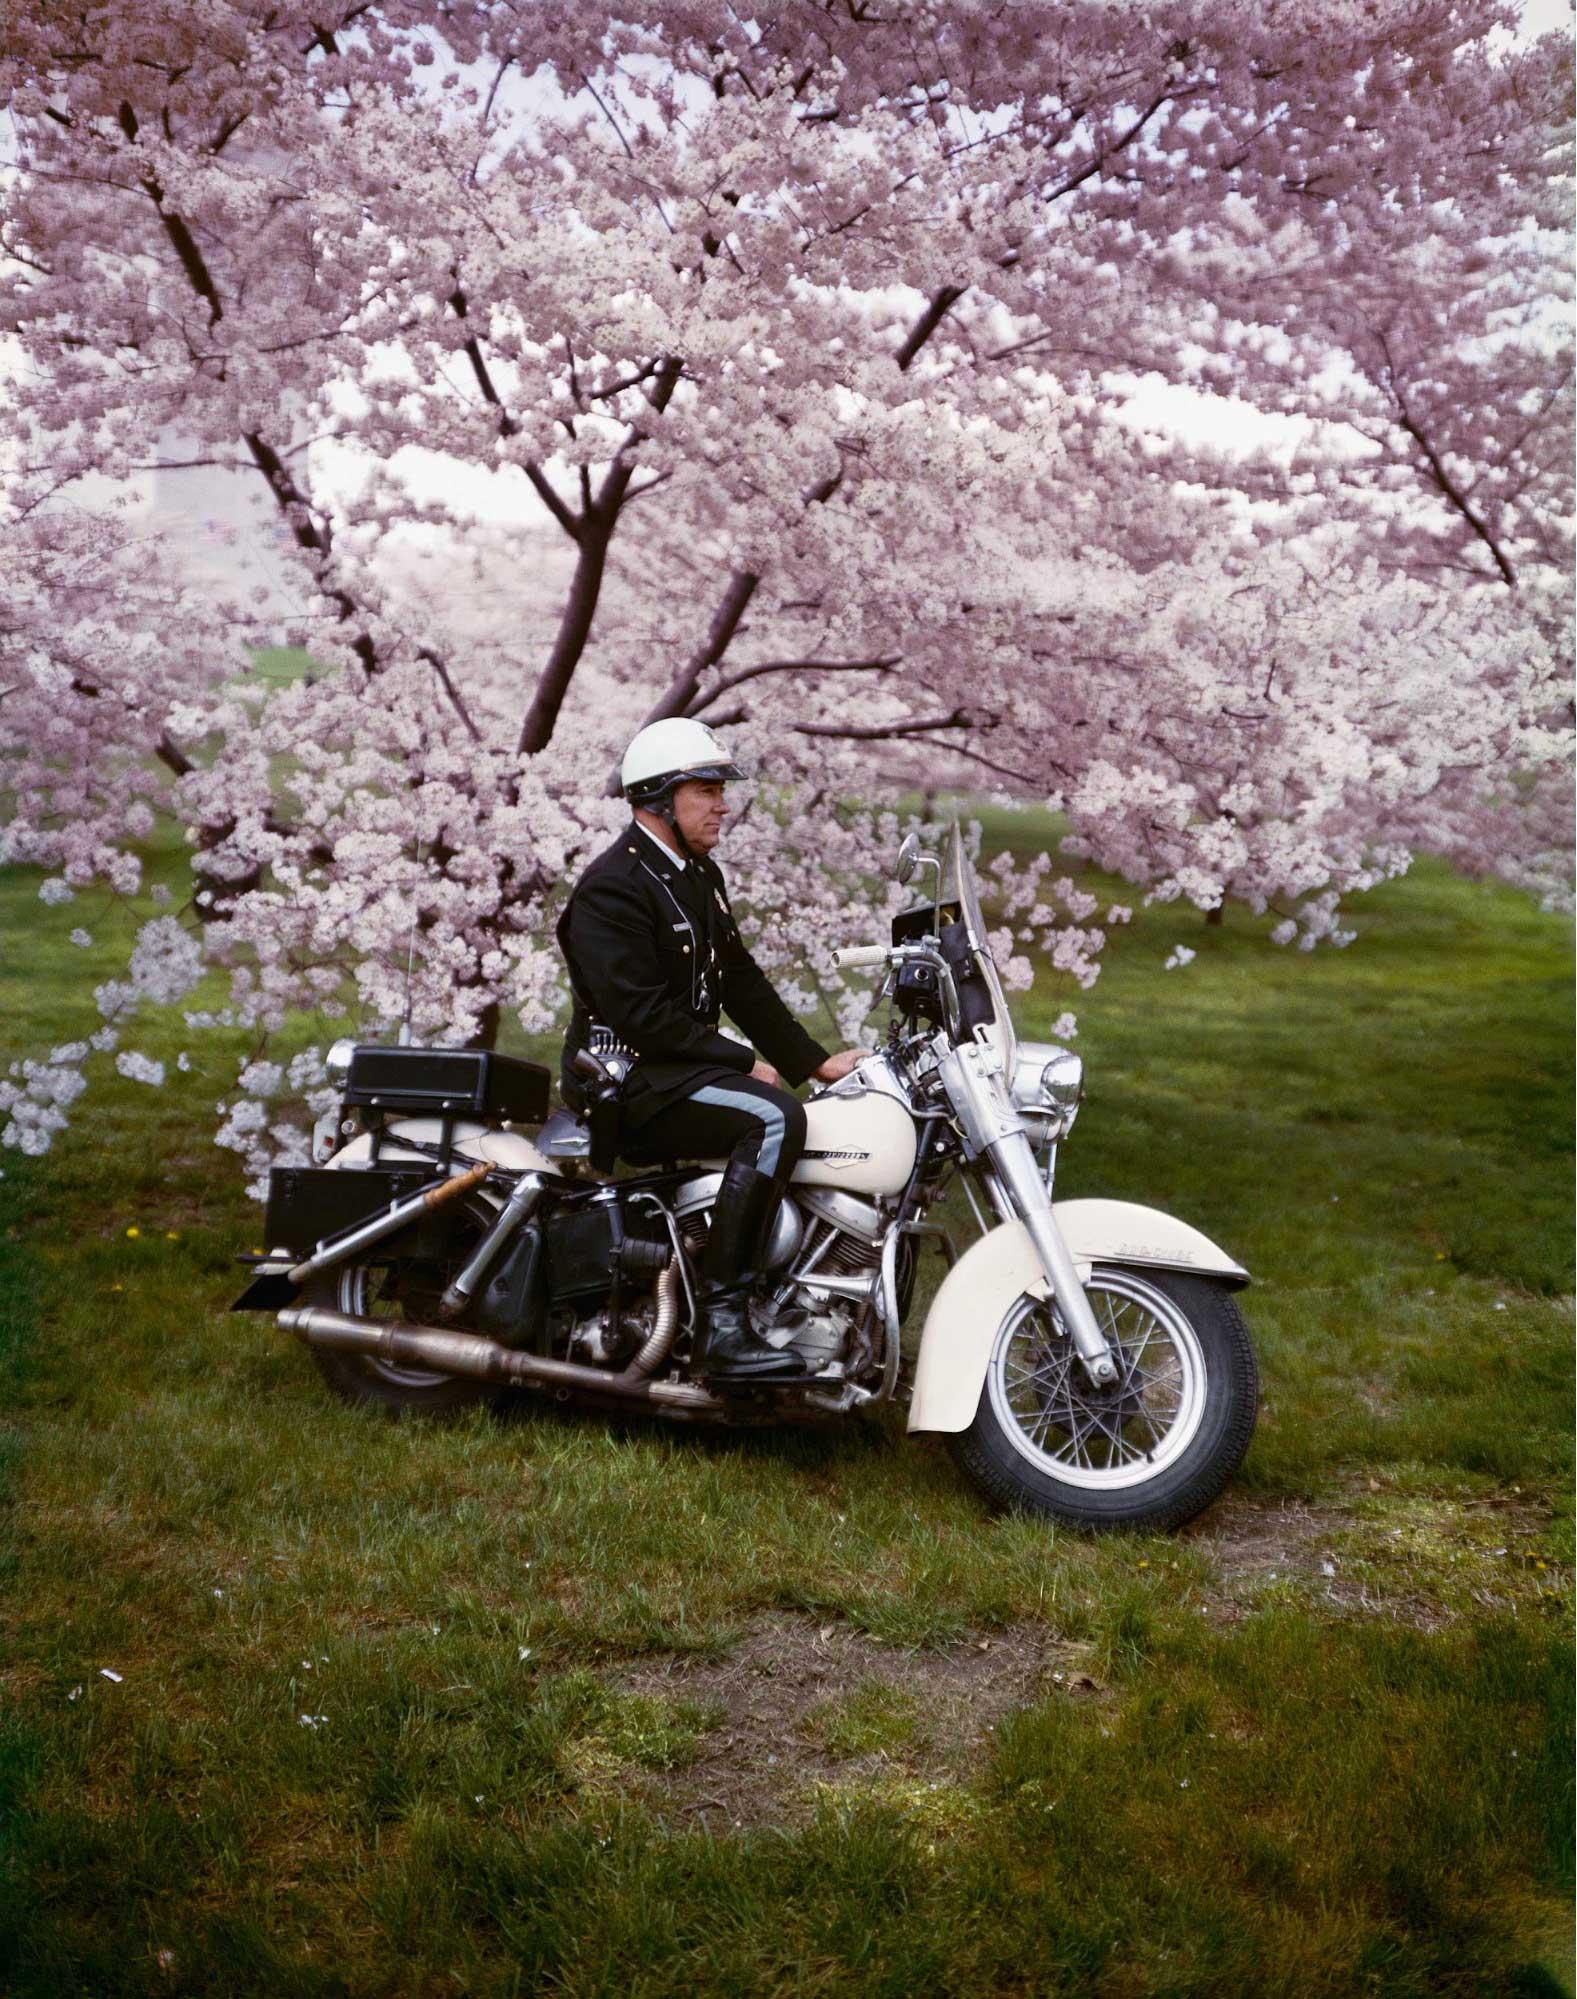 Frühling, Washington, 1965, Farbfotografie von Evelyn Hofer